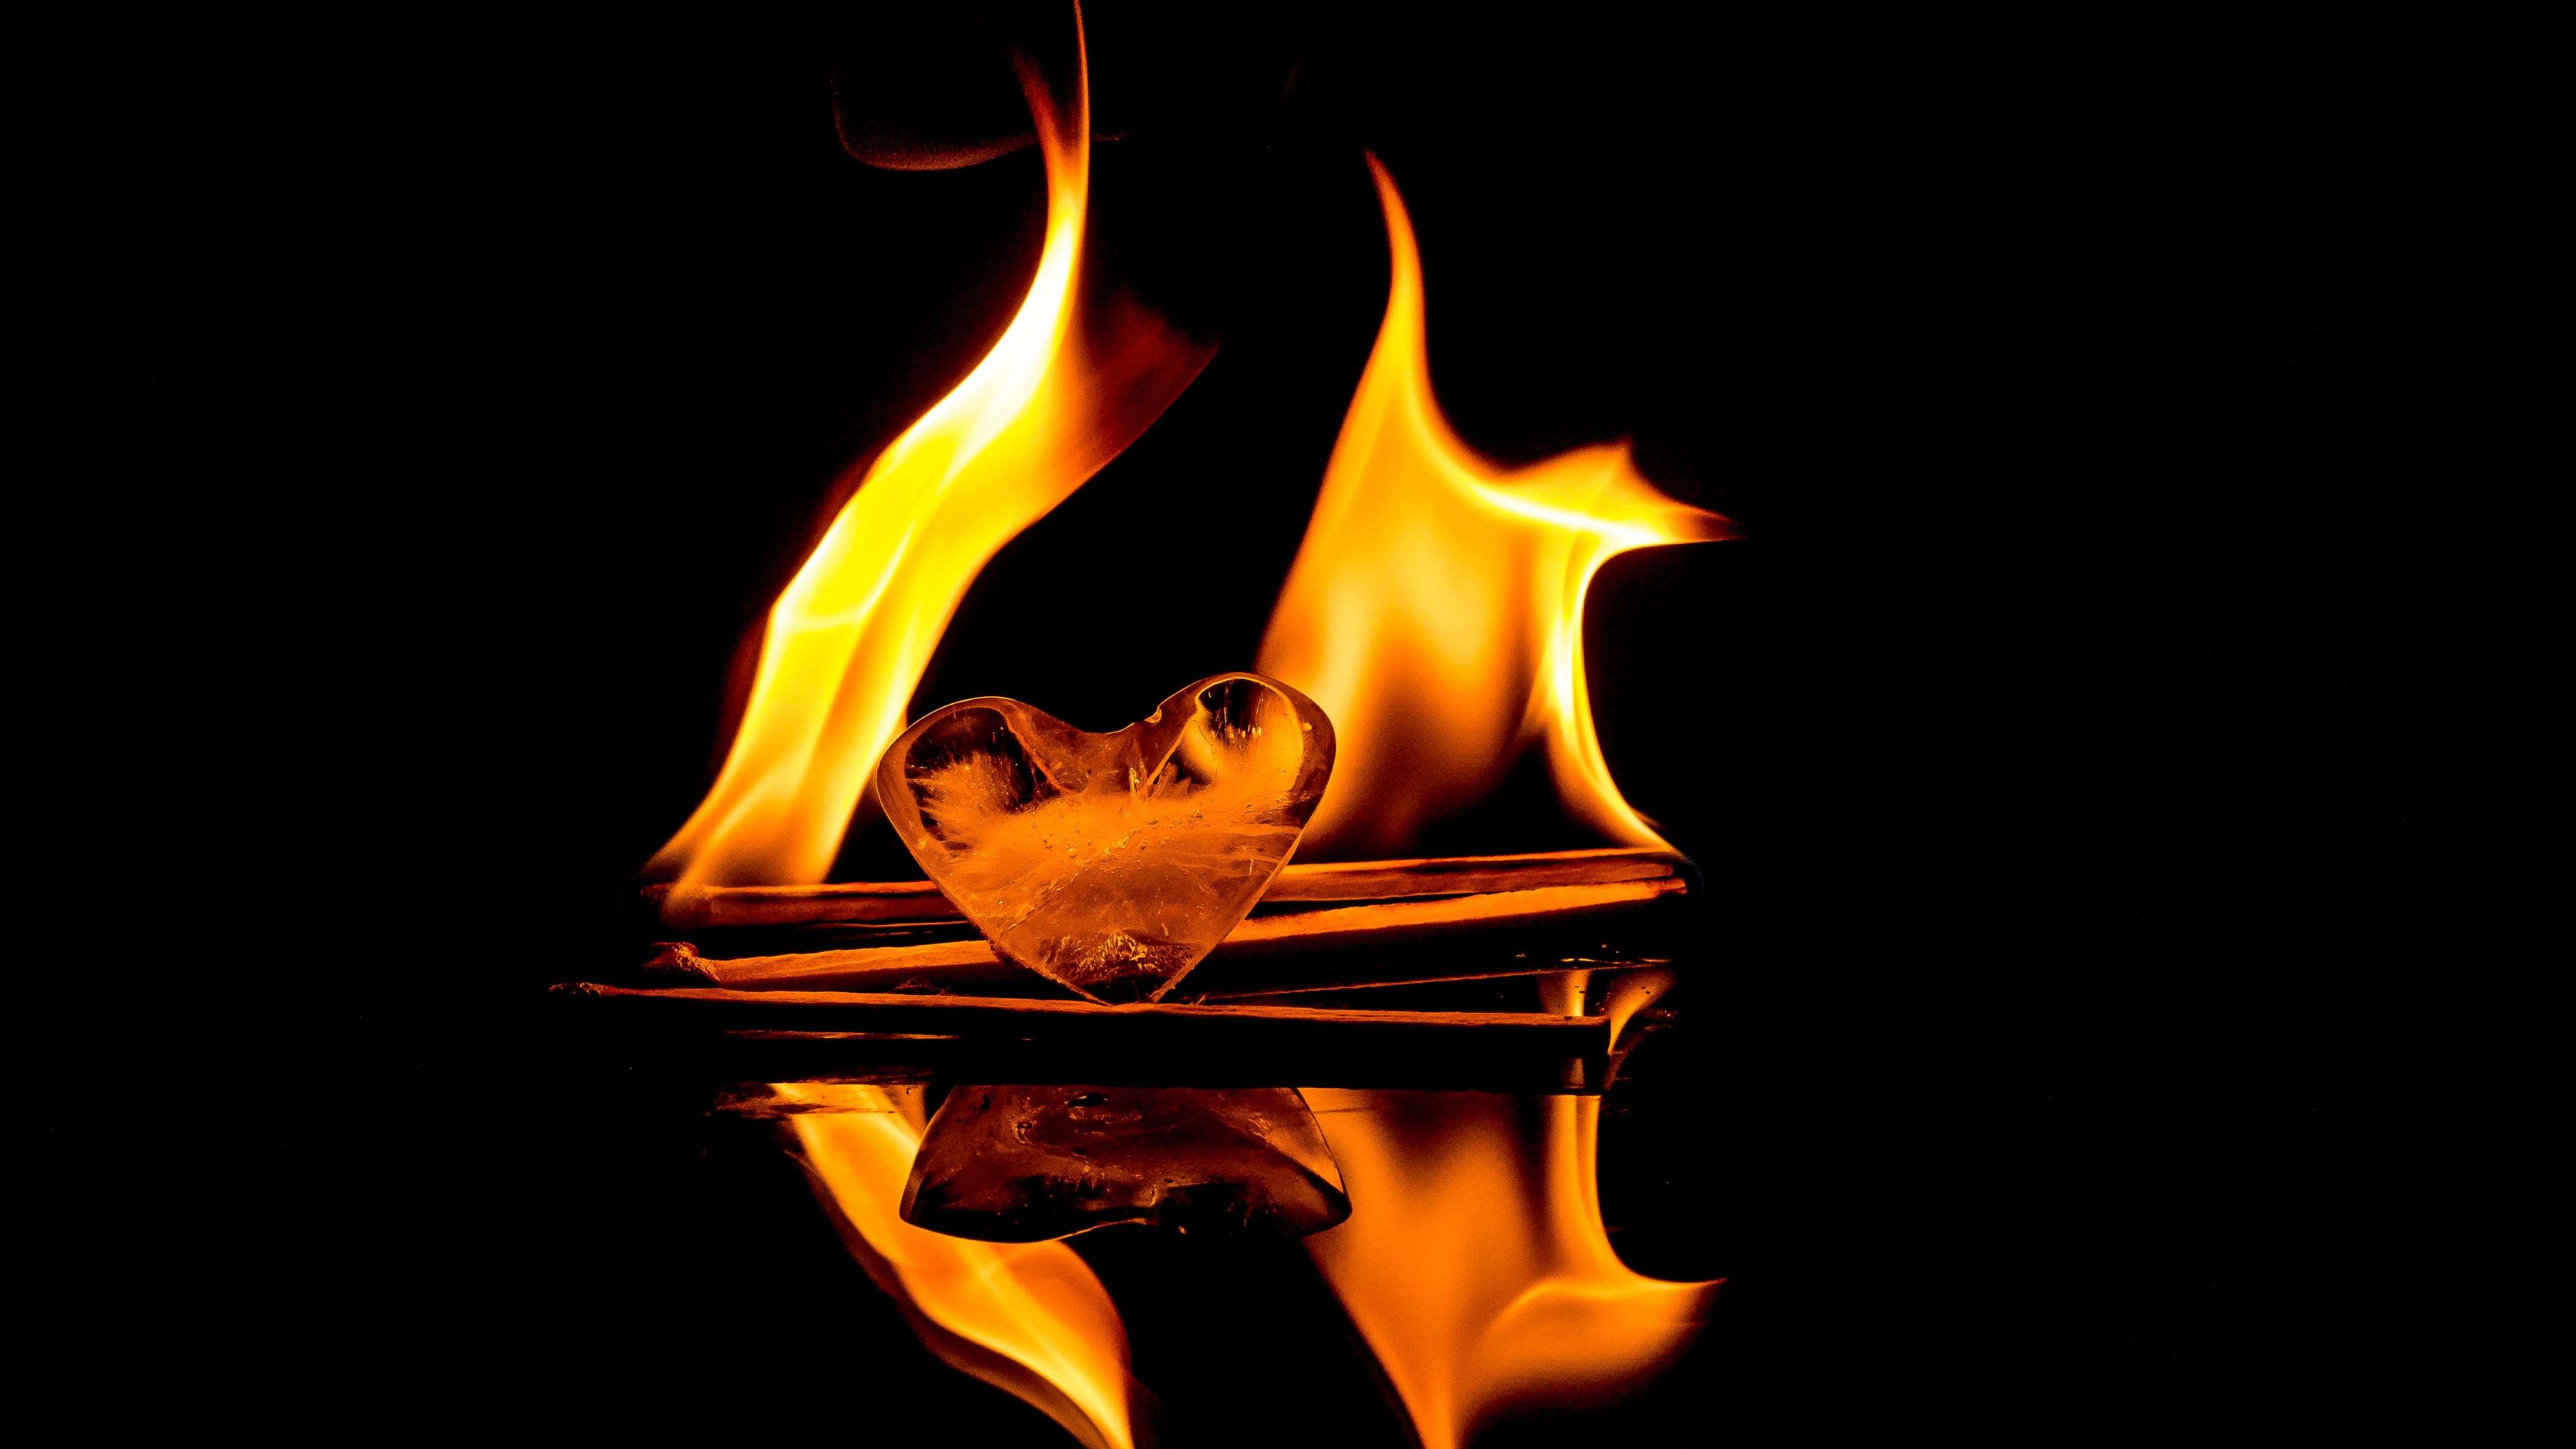 Fire 4k Ultra HD Wallpaper | Background Image | 3840x2160 ...